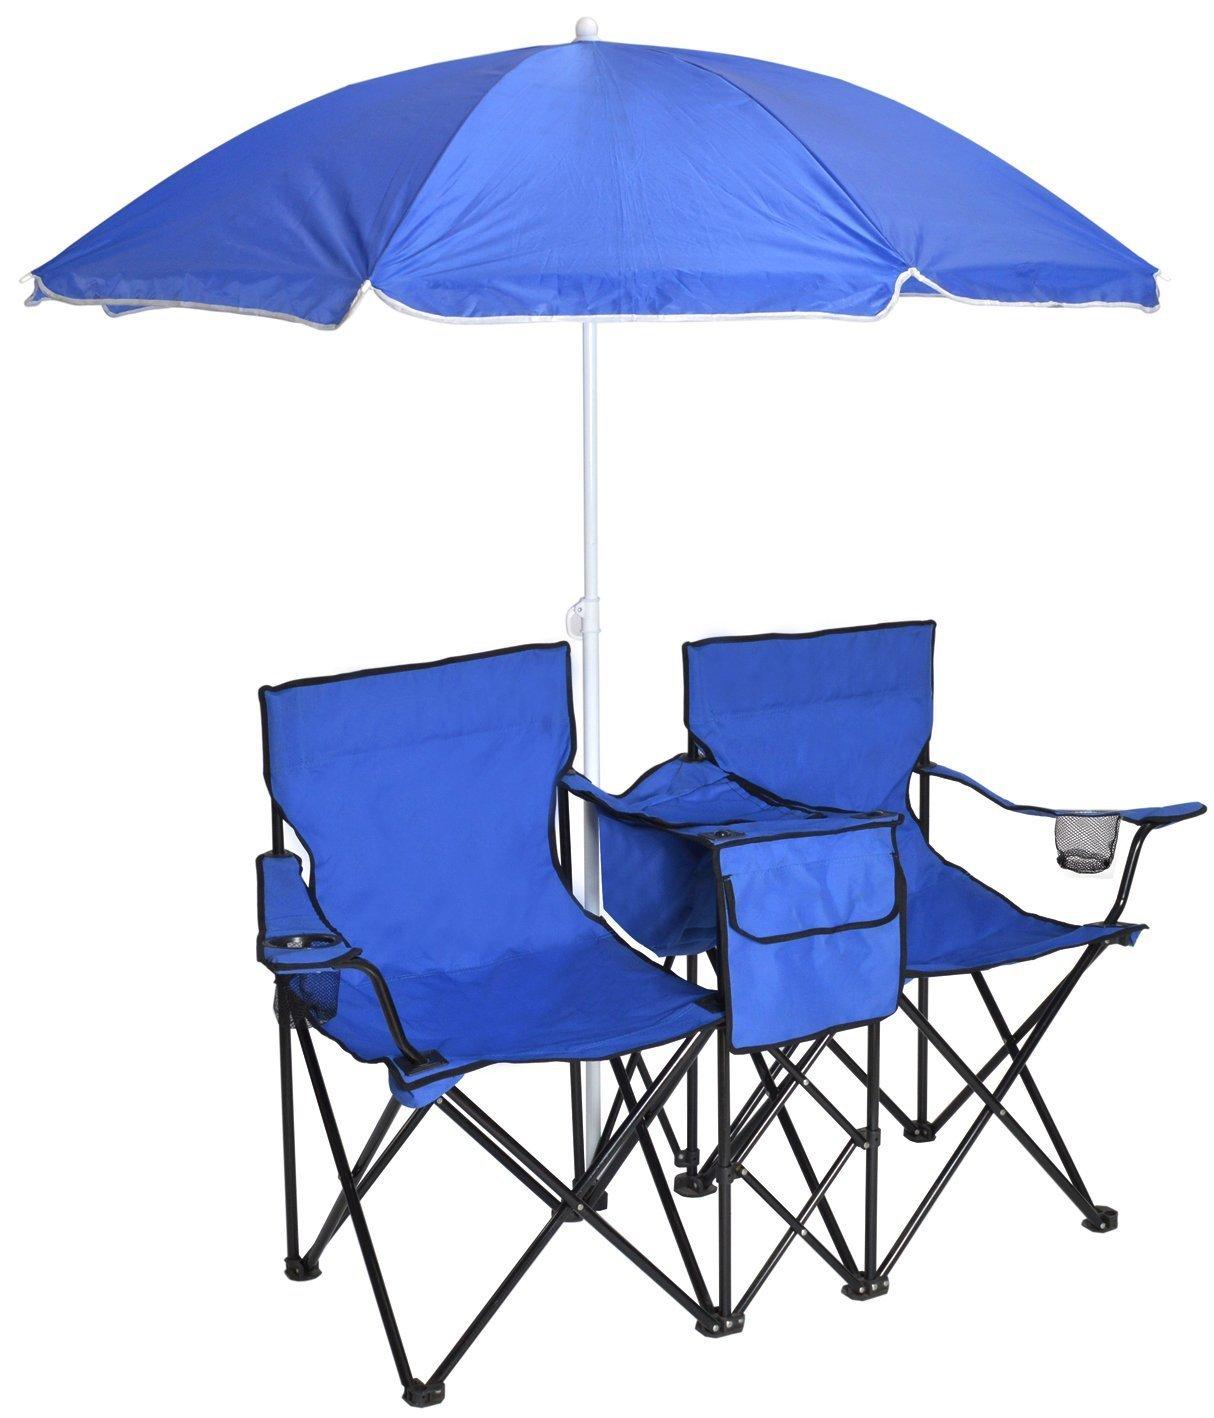 TMS Double Chair w/ Umbrella Portable Folding Table Cooler Pinic Camping Beach Chair Blue [並行輸入品] B0742GF1JX